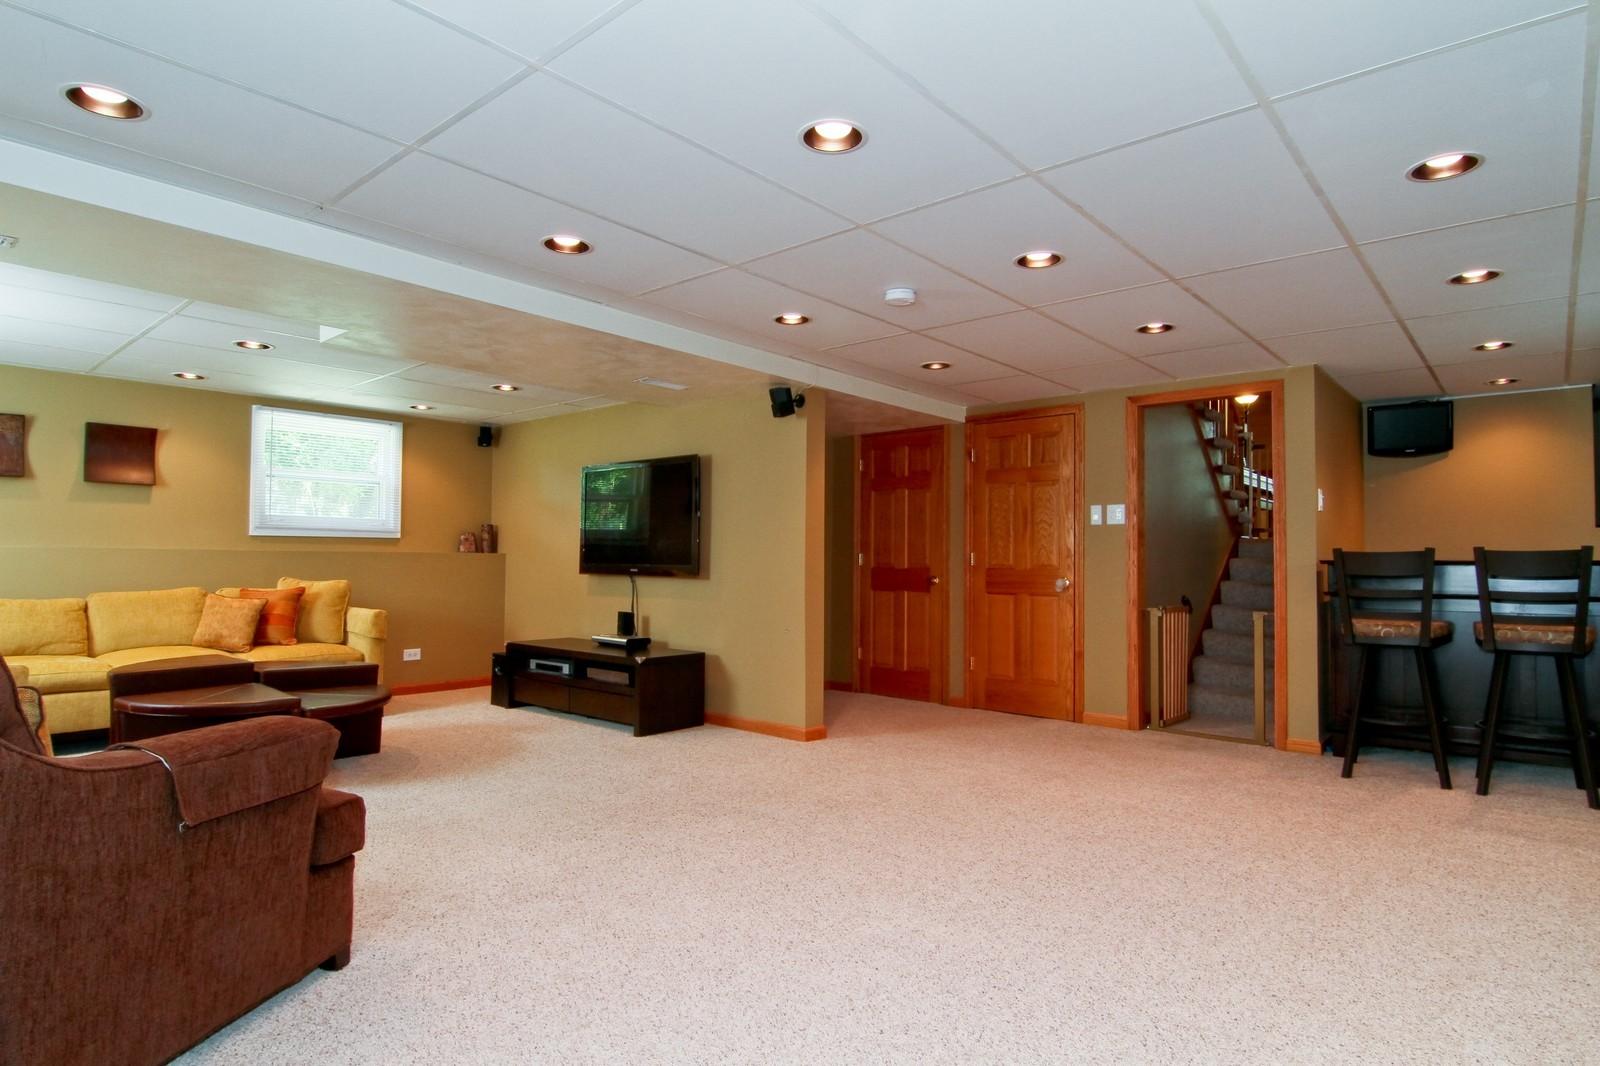 Real Estate Photography - 89 N Ott, Glen Ellyn, IL, 60137 - Family Room